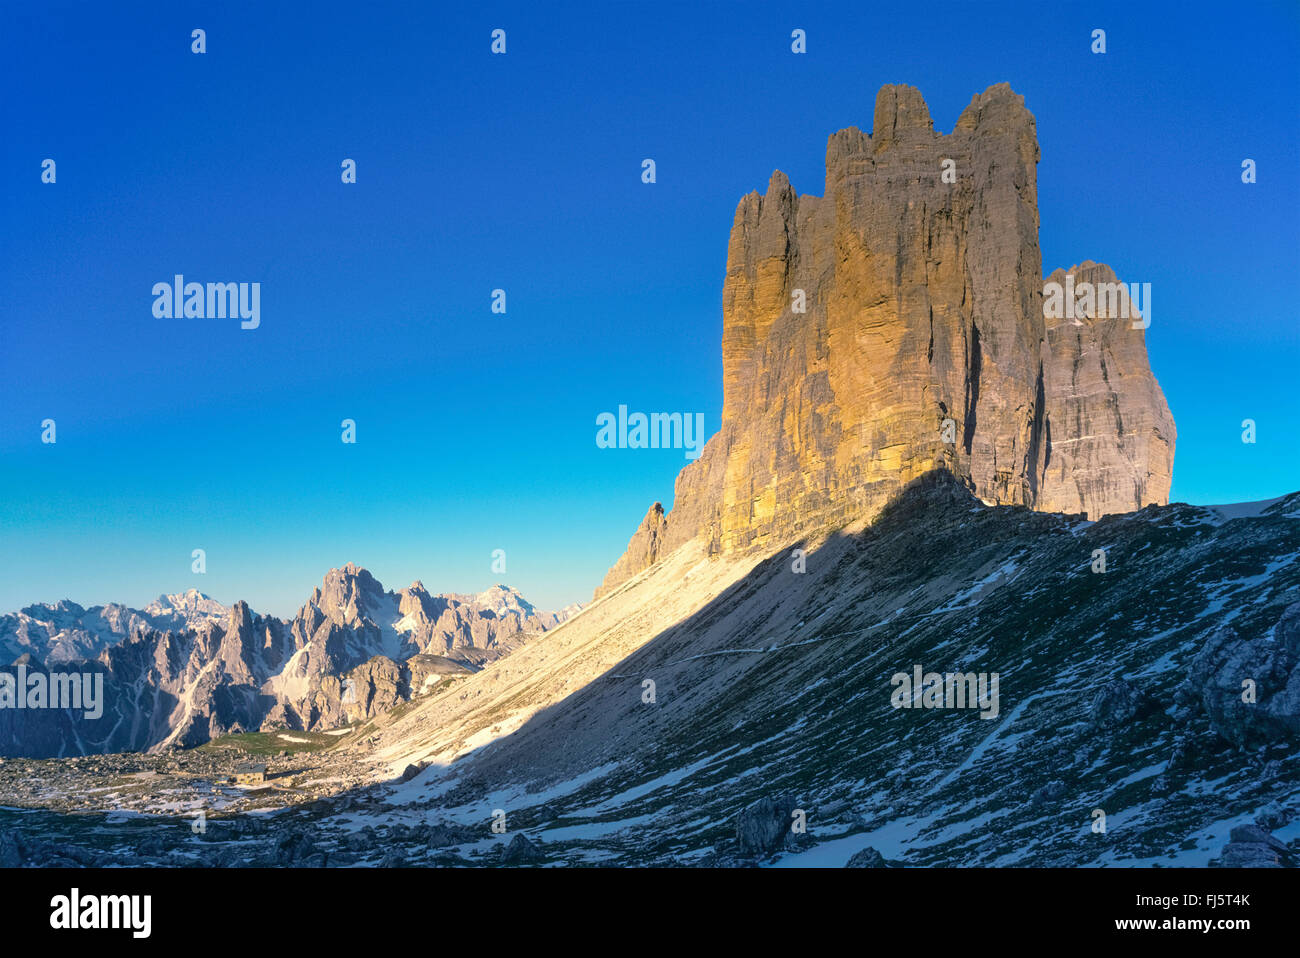 Tre Cime di Lavaredo, Italy, South Tyrol, Dolomites - Stock Image